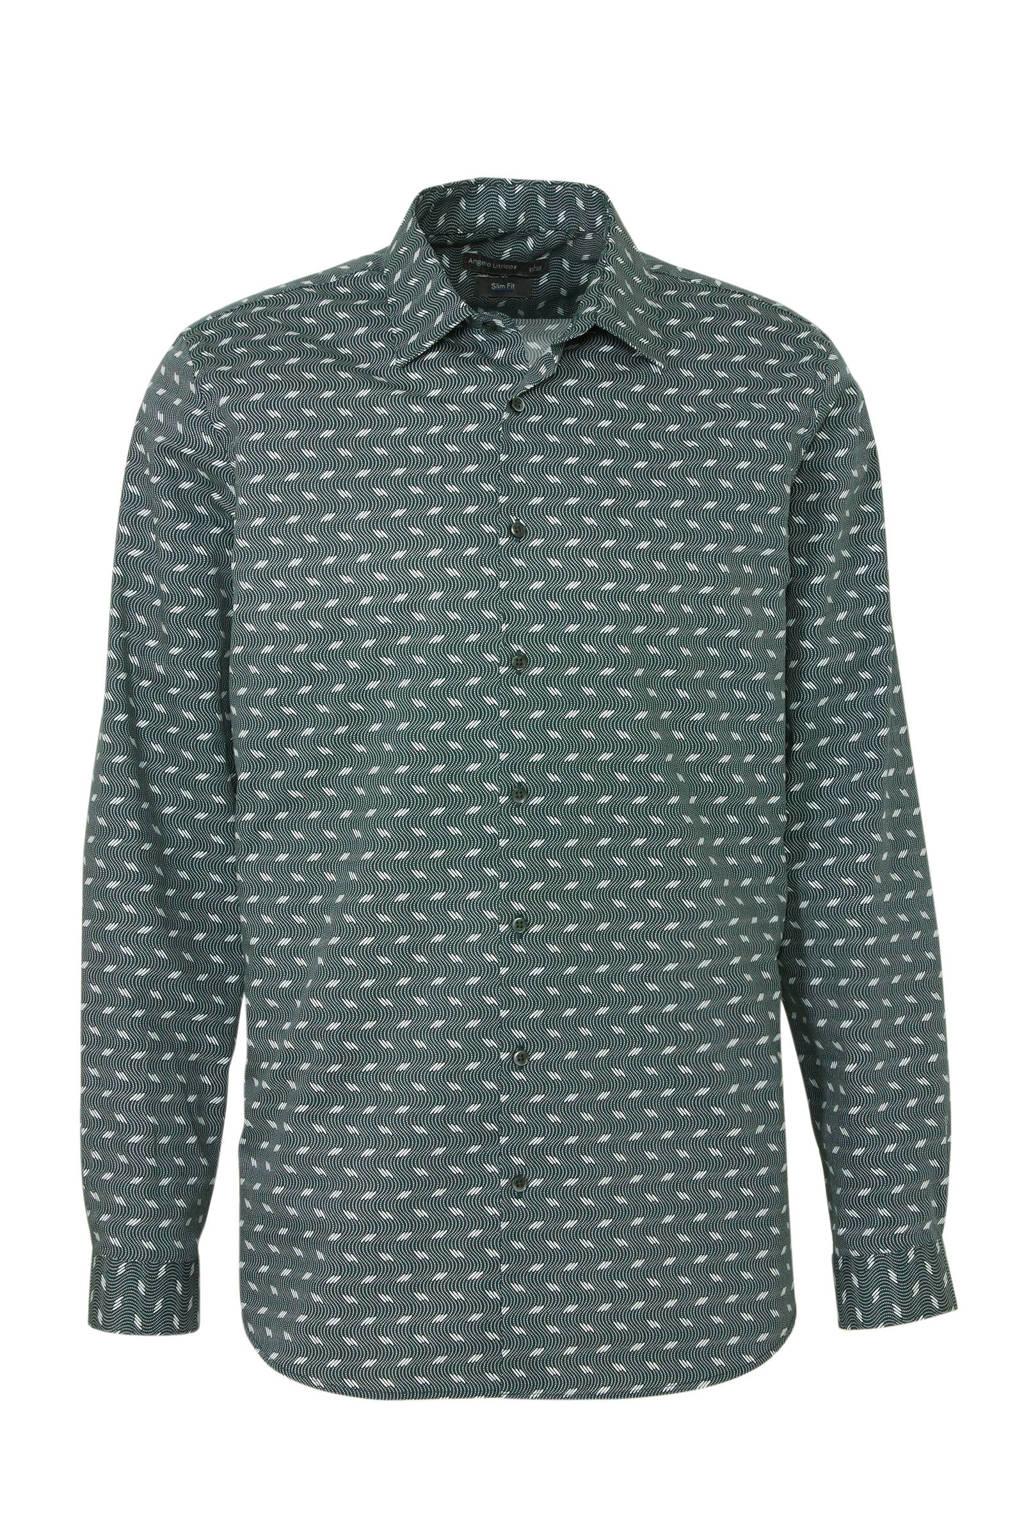 C&A Angelo Litrico slim fit overhemd met printopdruk antraciet, Antraciet